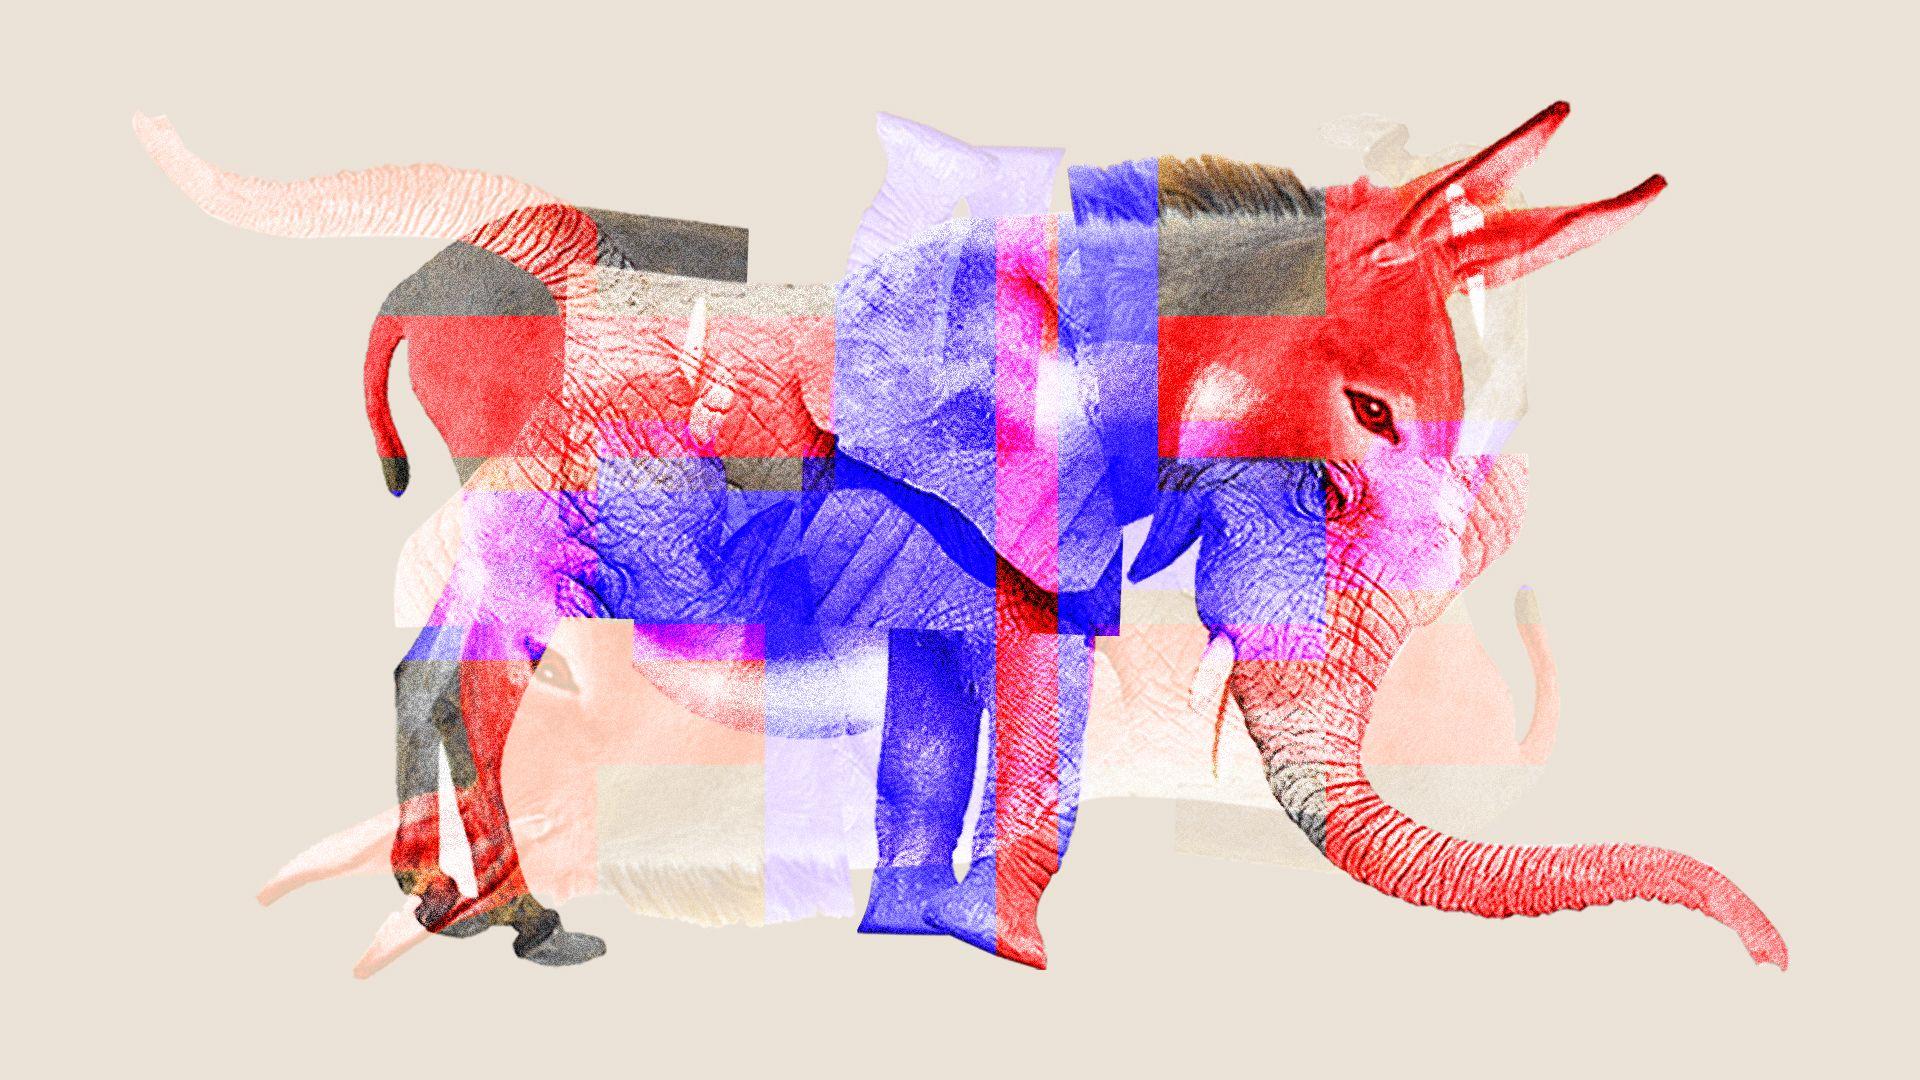 Illustration of a mix of elephant and donkey to show partisanship mix